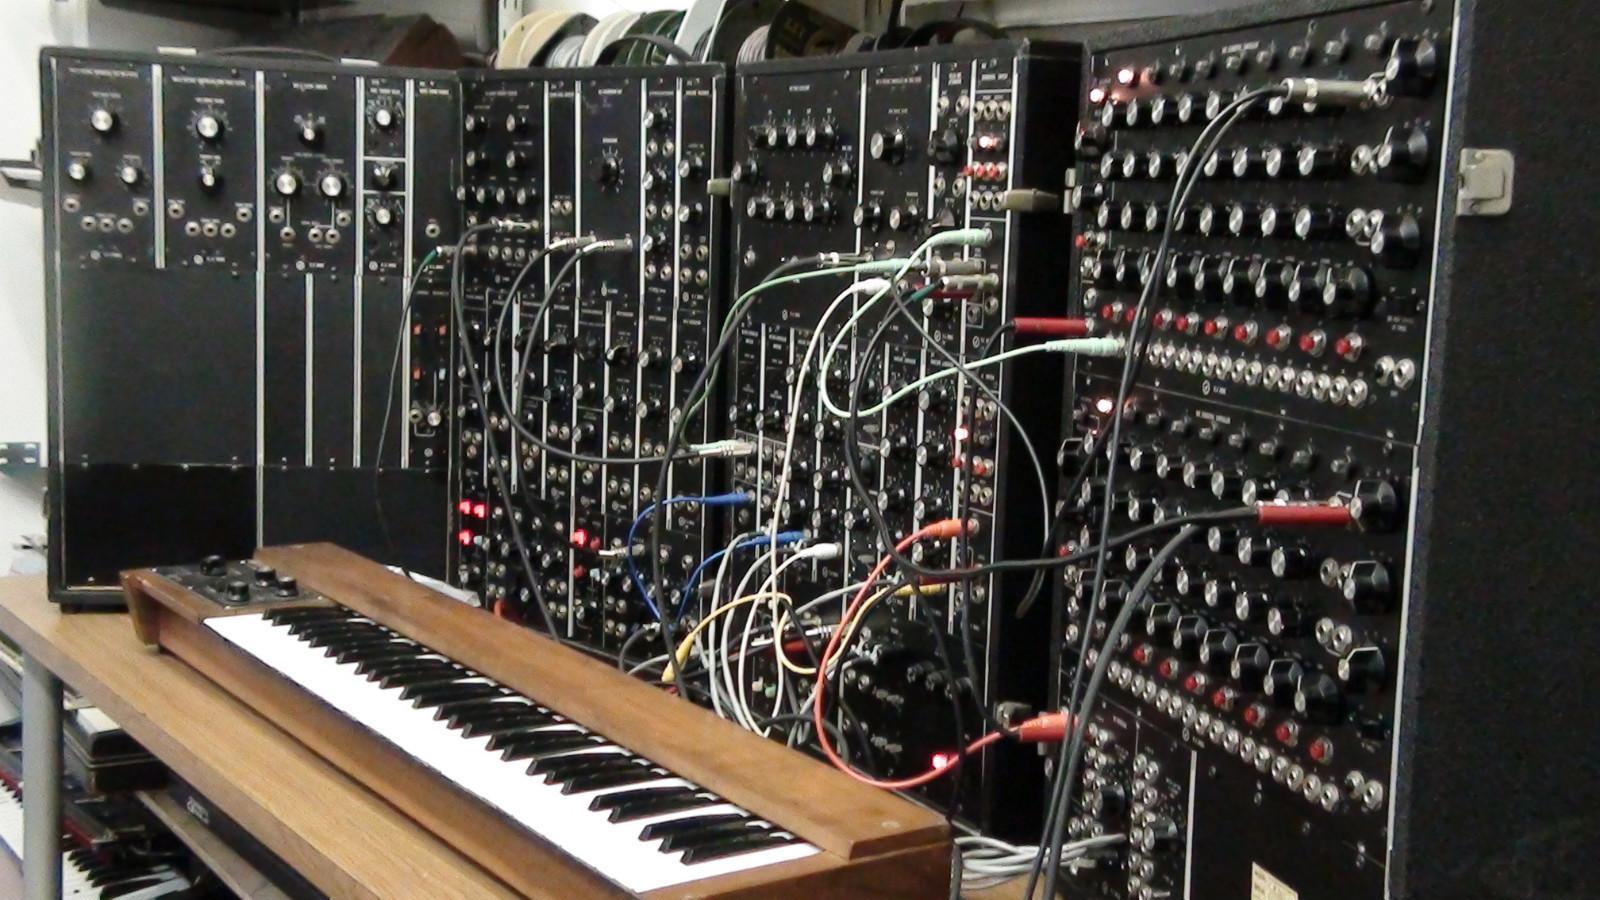 moog modular hd extraordinary - photo #7